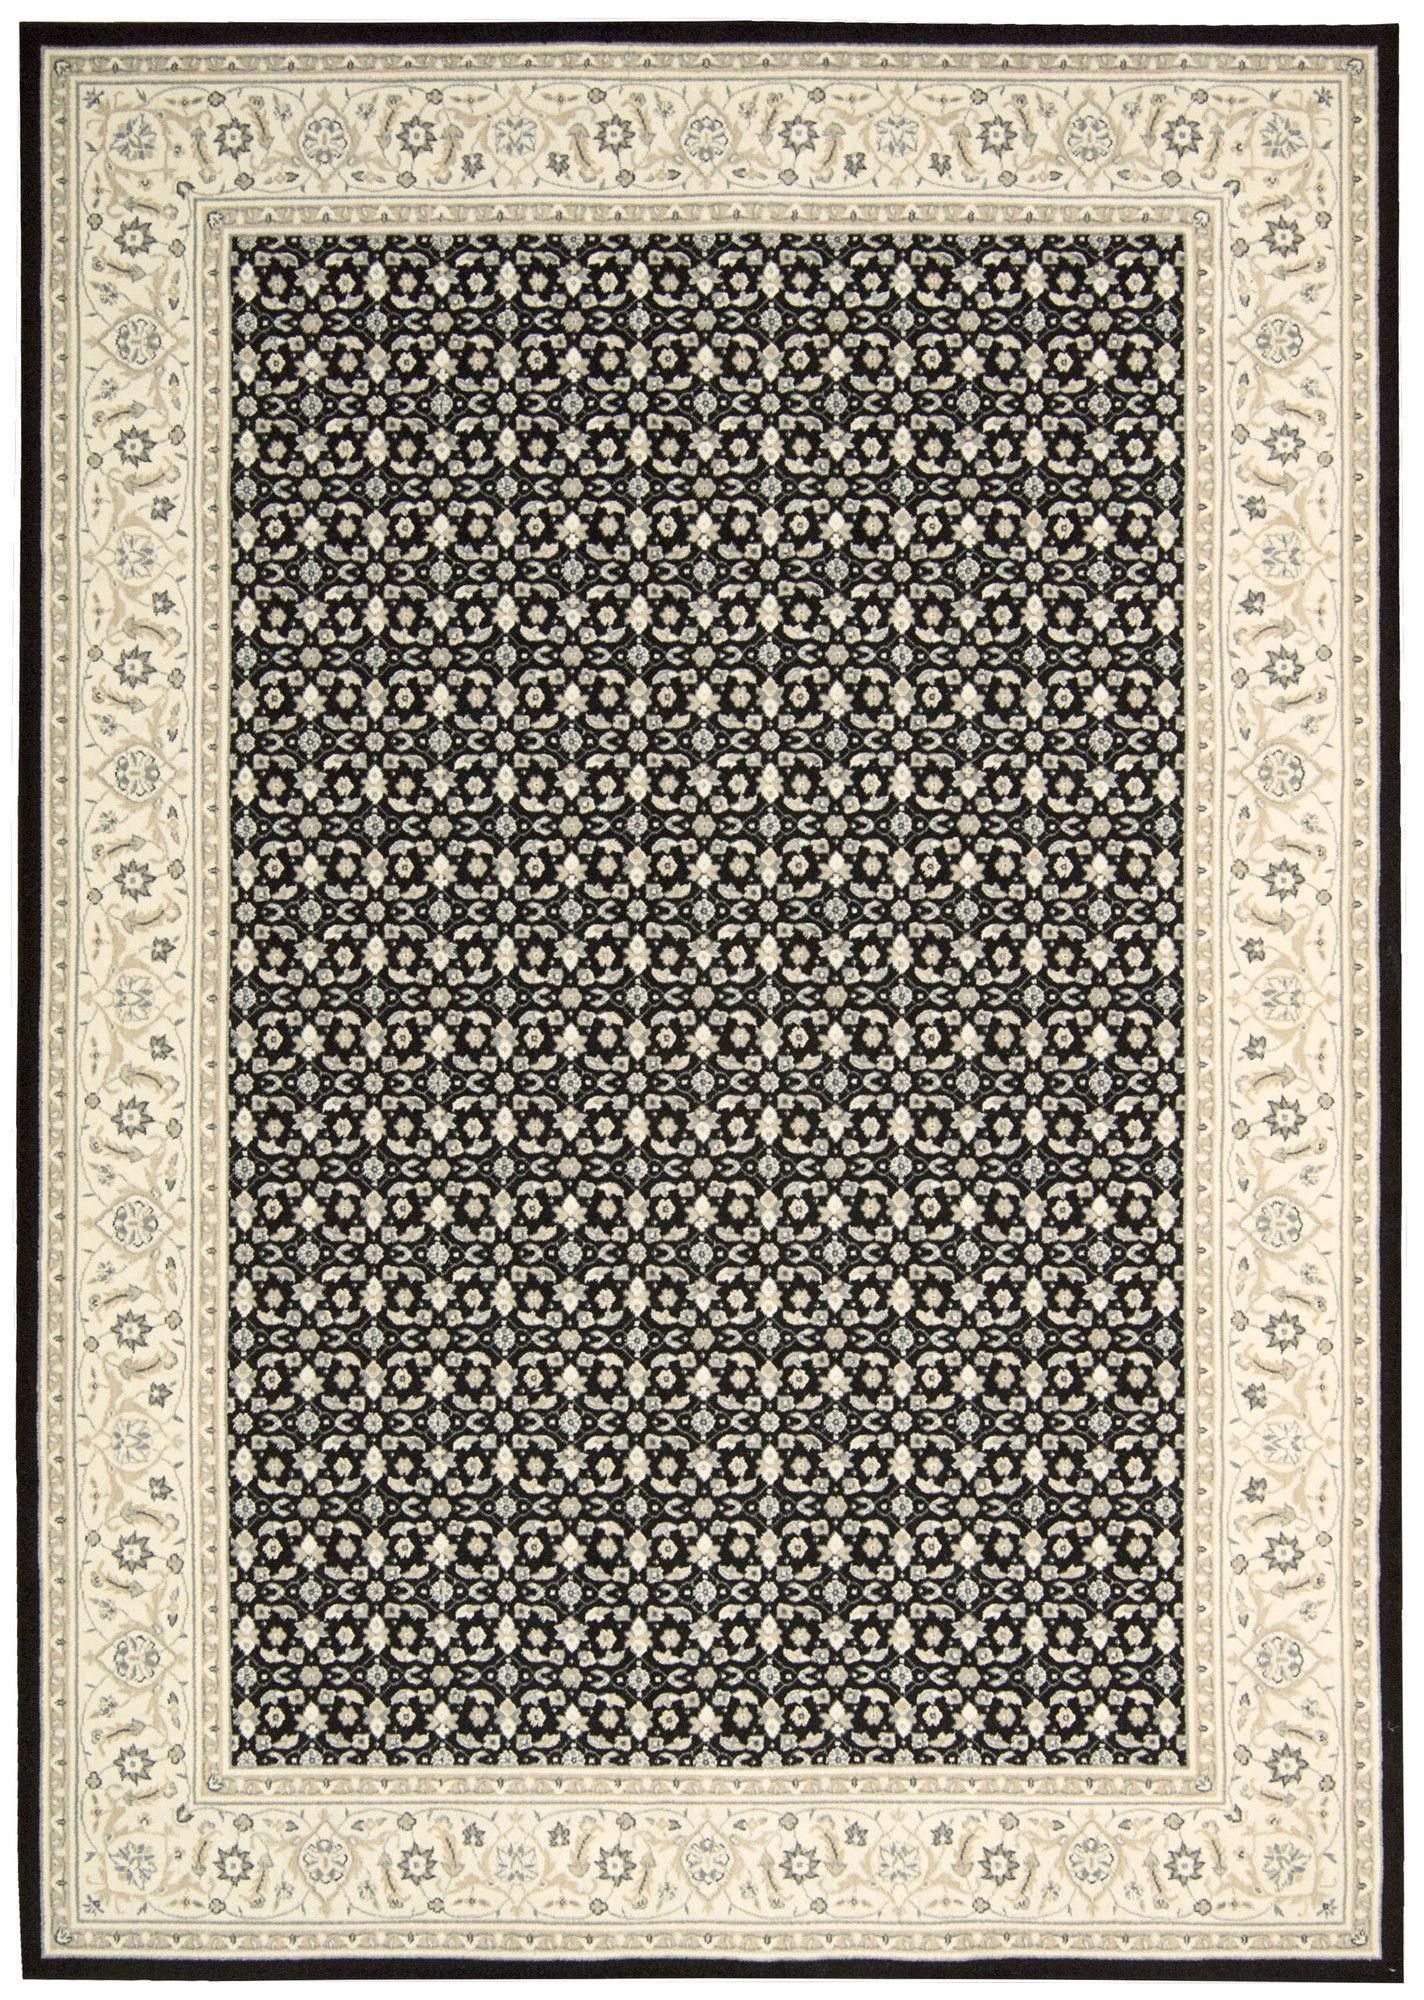 Carpet Runners Hallways Lowes Carpetrunnershalifaxns Carpetsluxury